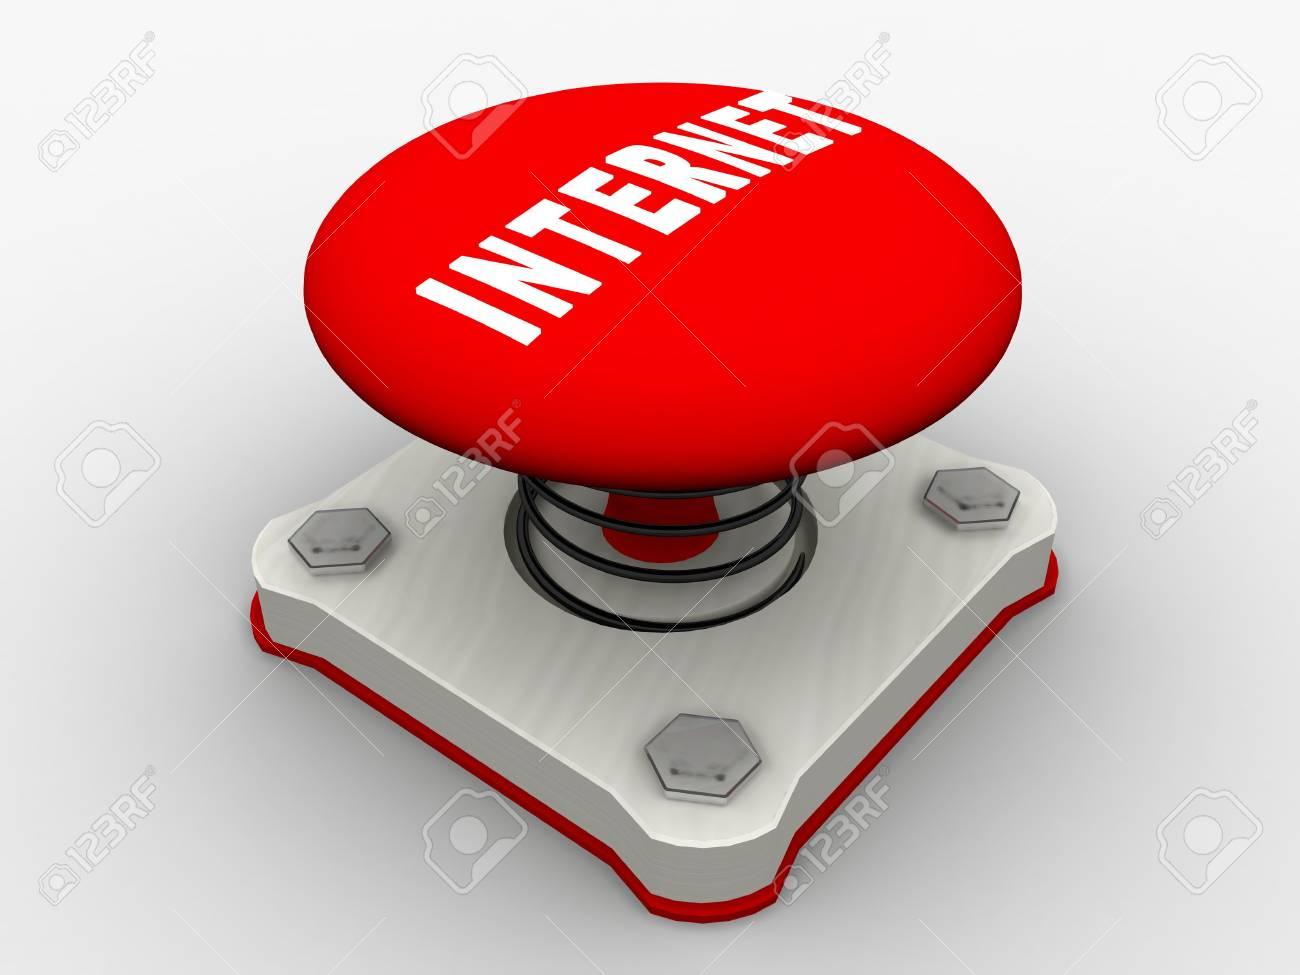 Red start button on a metal platform Stock Photo - 5037351